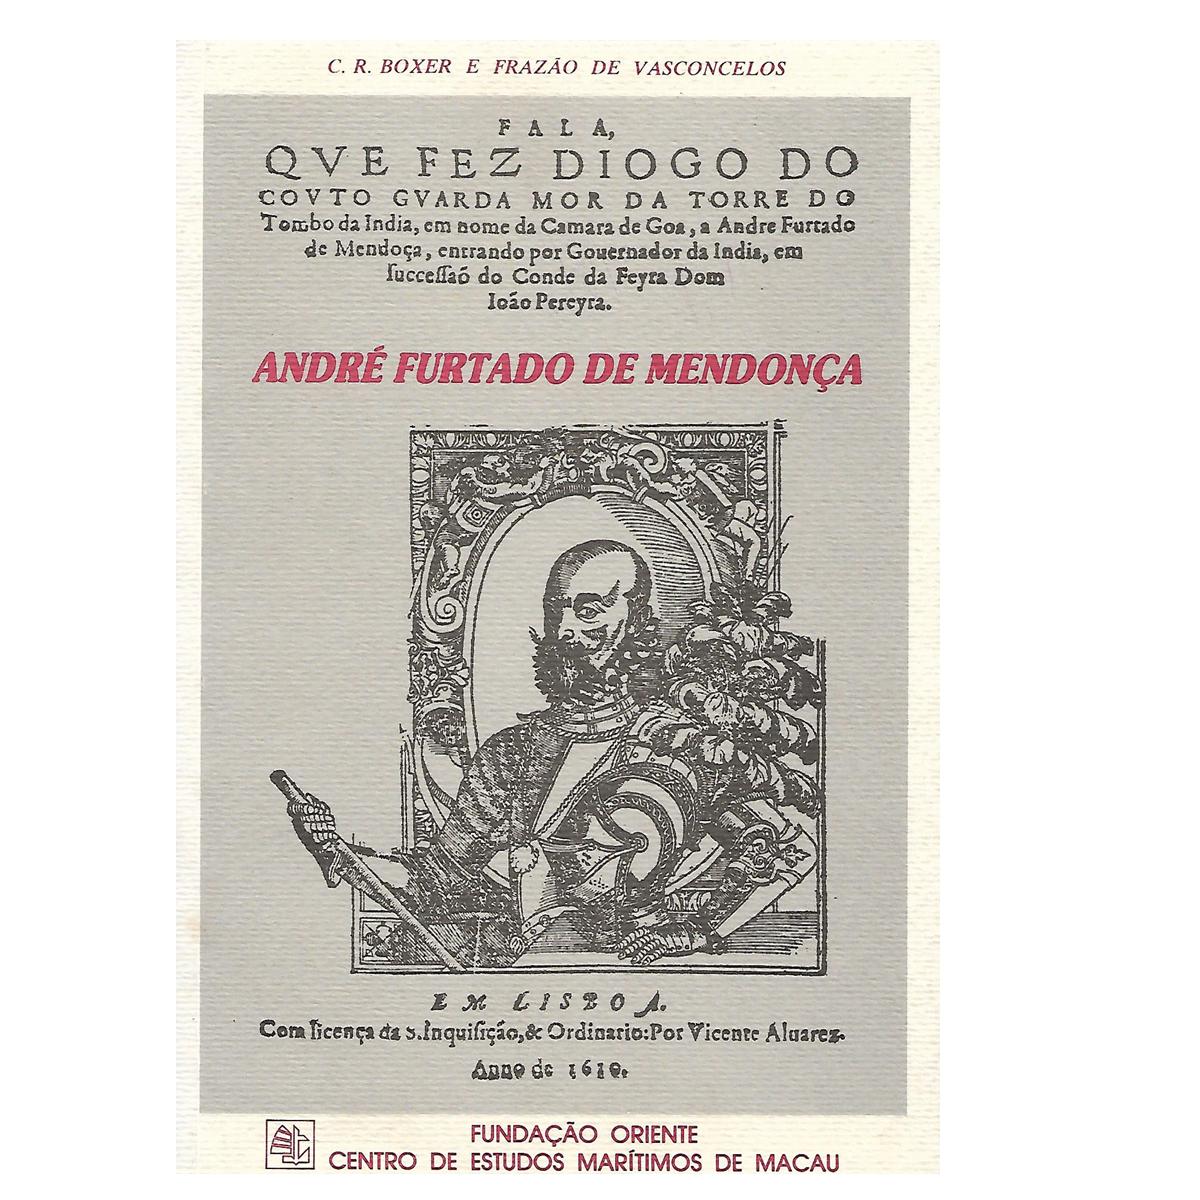 André Furtado de Mendonça (1558-1610).